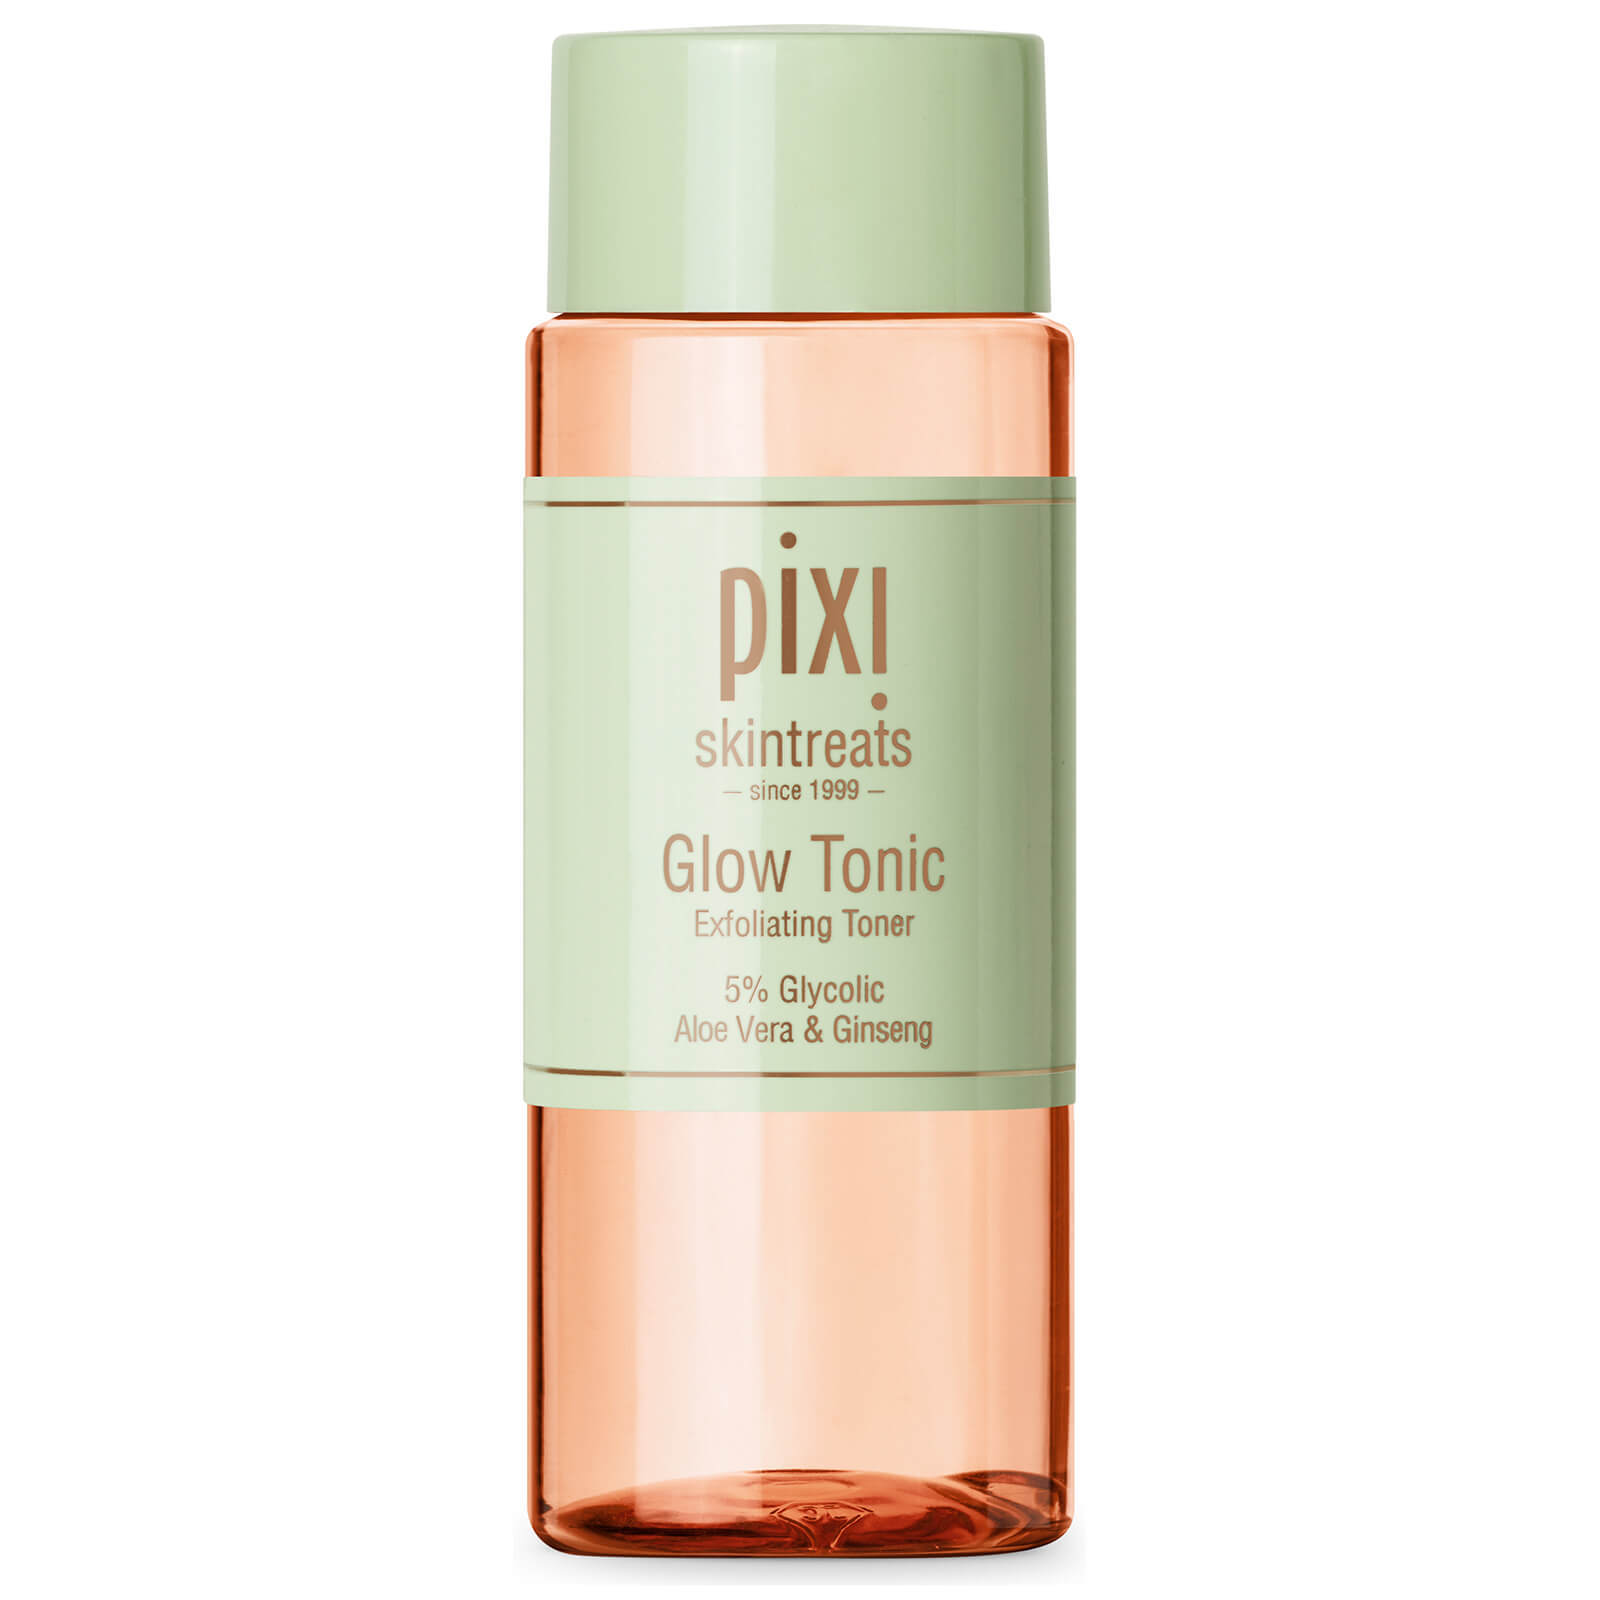 Тоник Pixi Glow Tonic отшелушивающий 100 мл